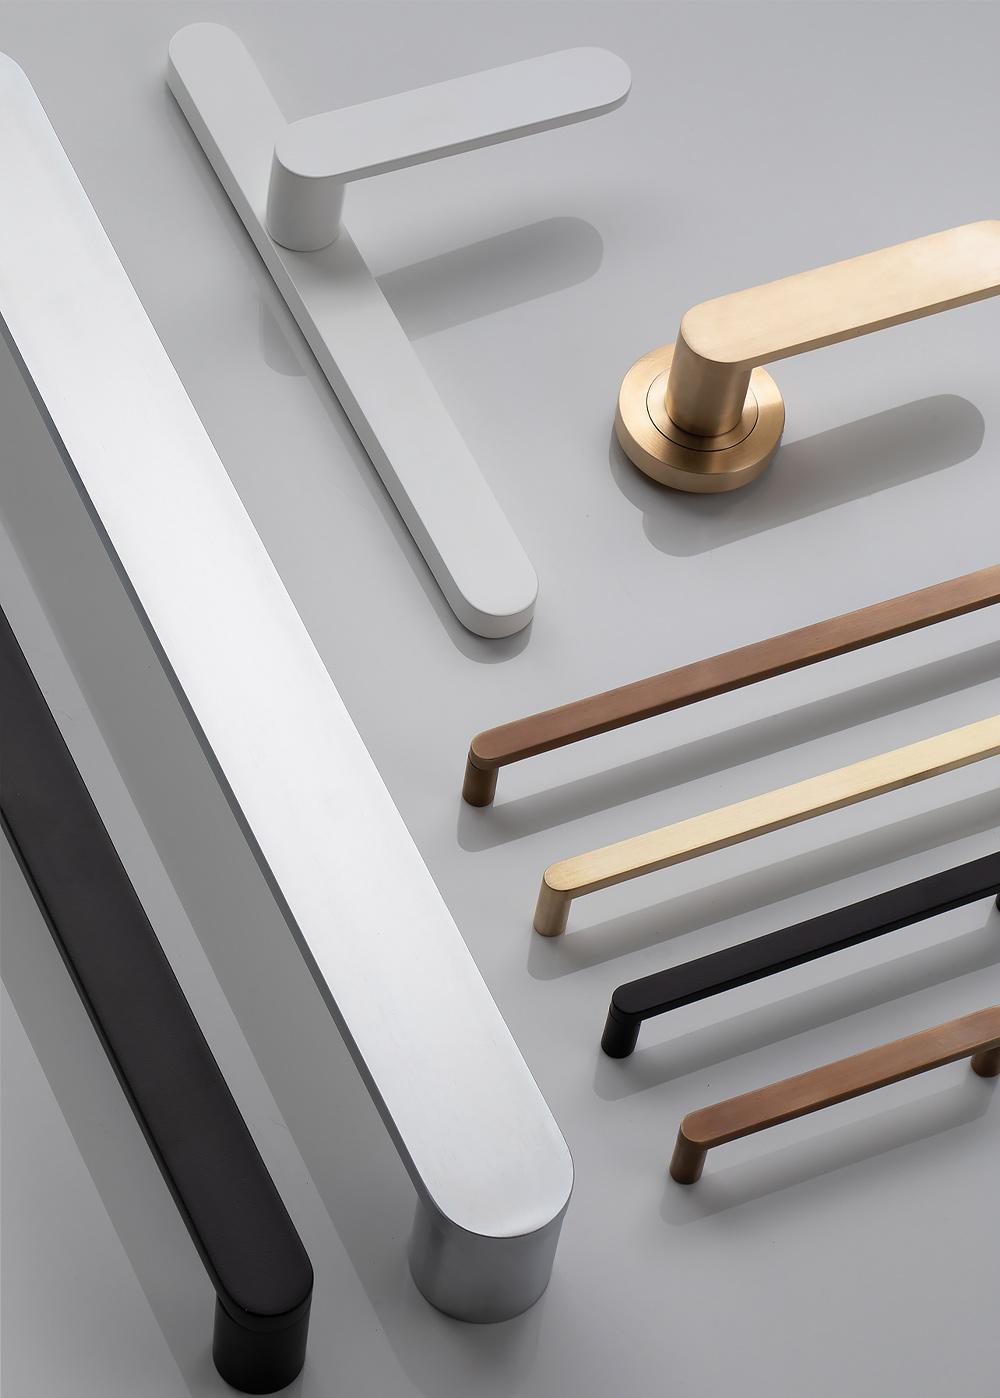 Designer Doorway doorknobs in a variety of finishes